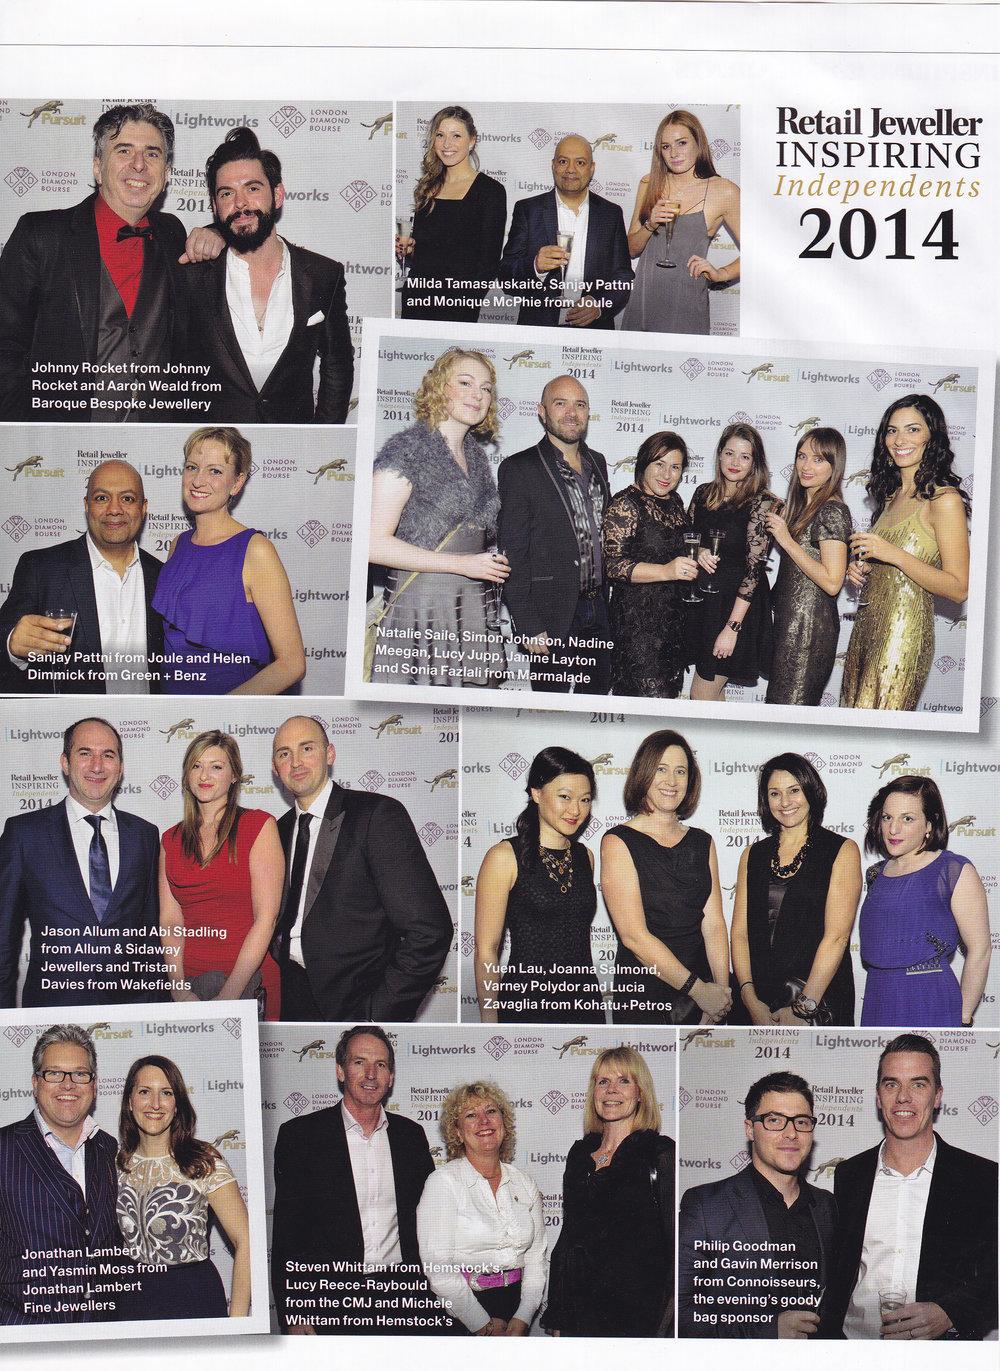 Inspiring Independents 2014 KP team.jpg